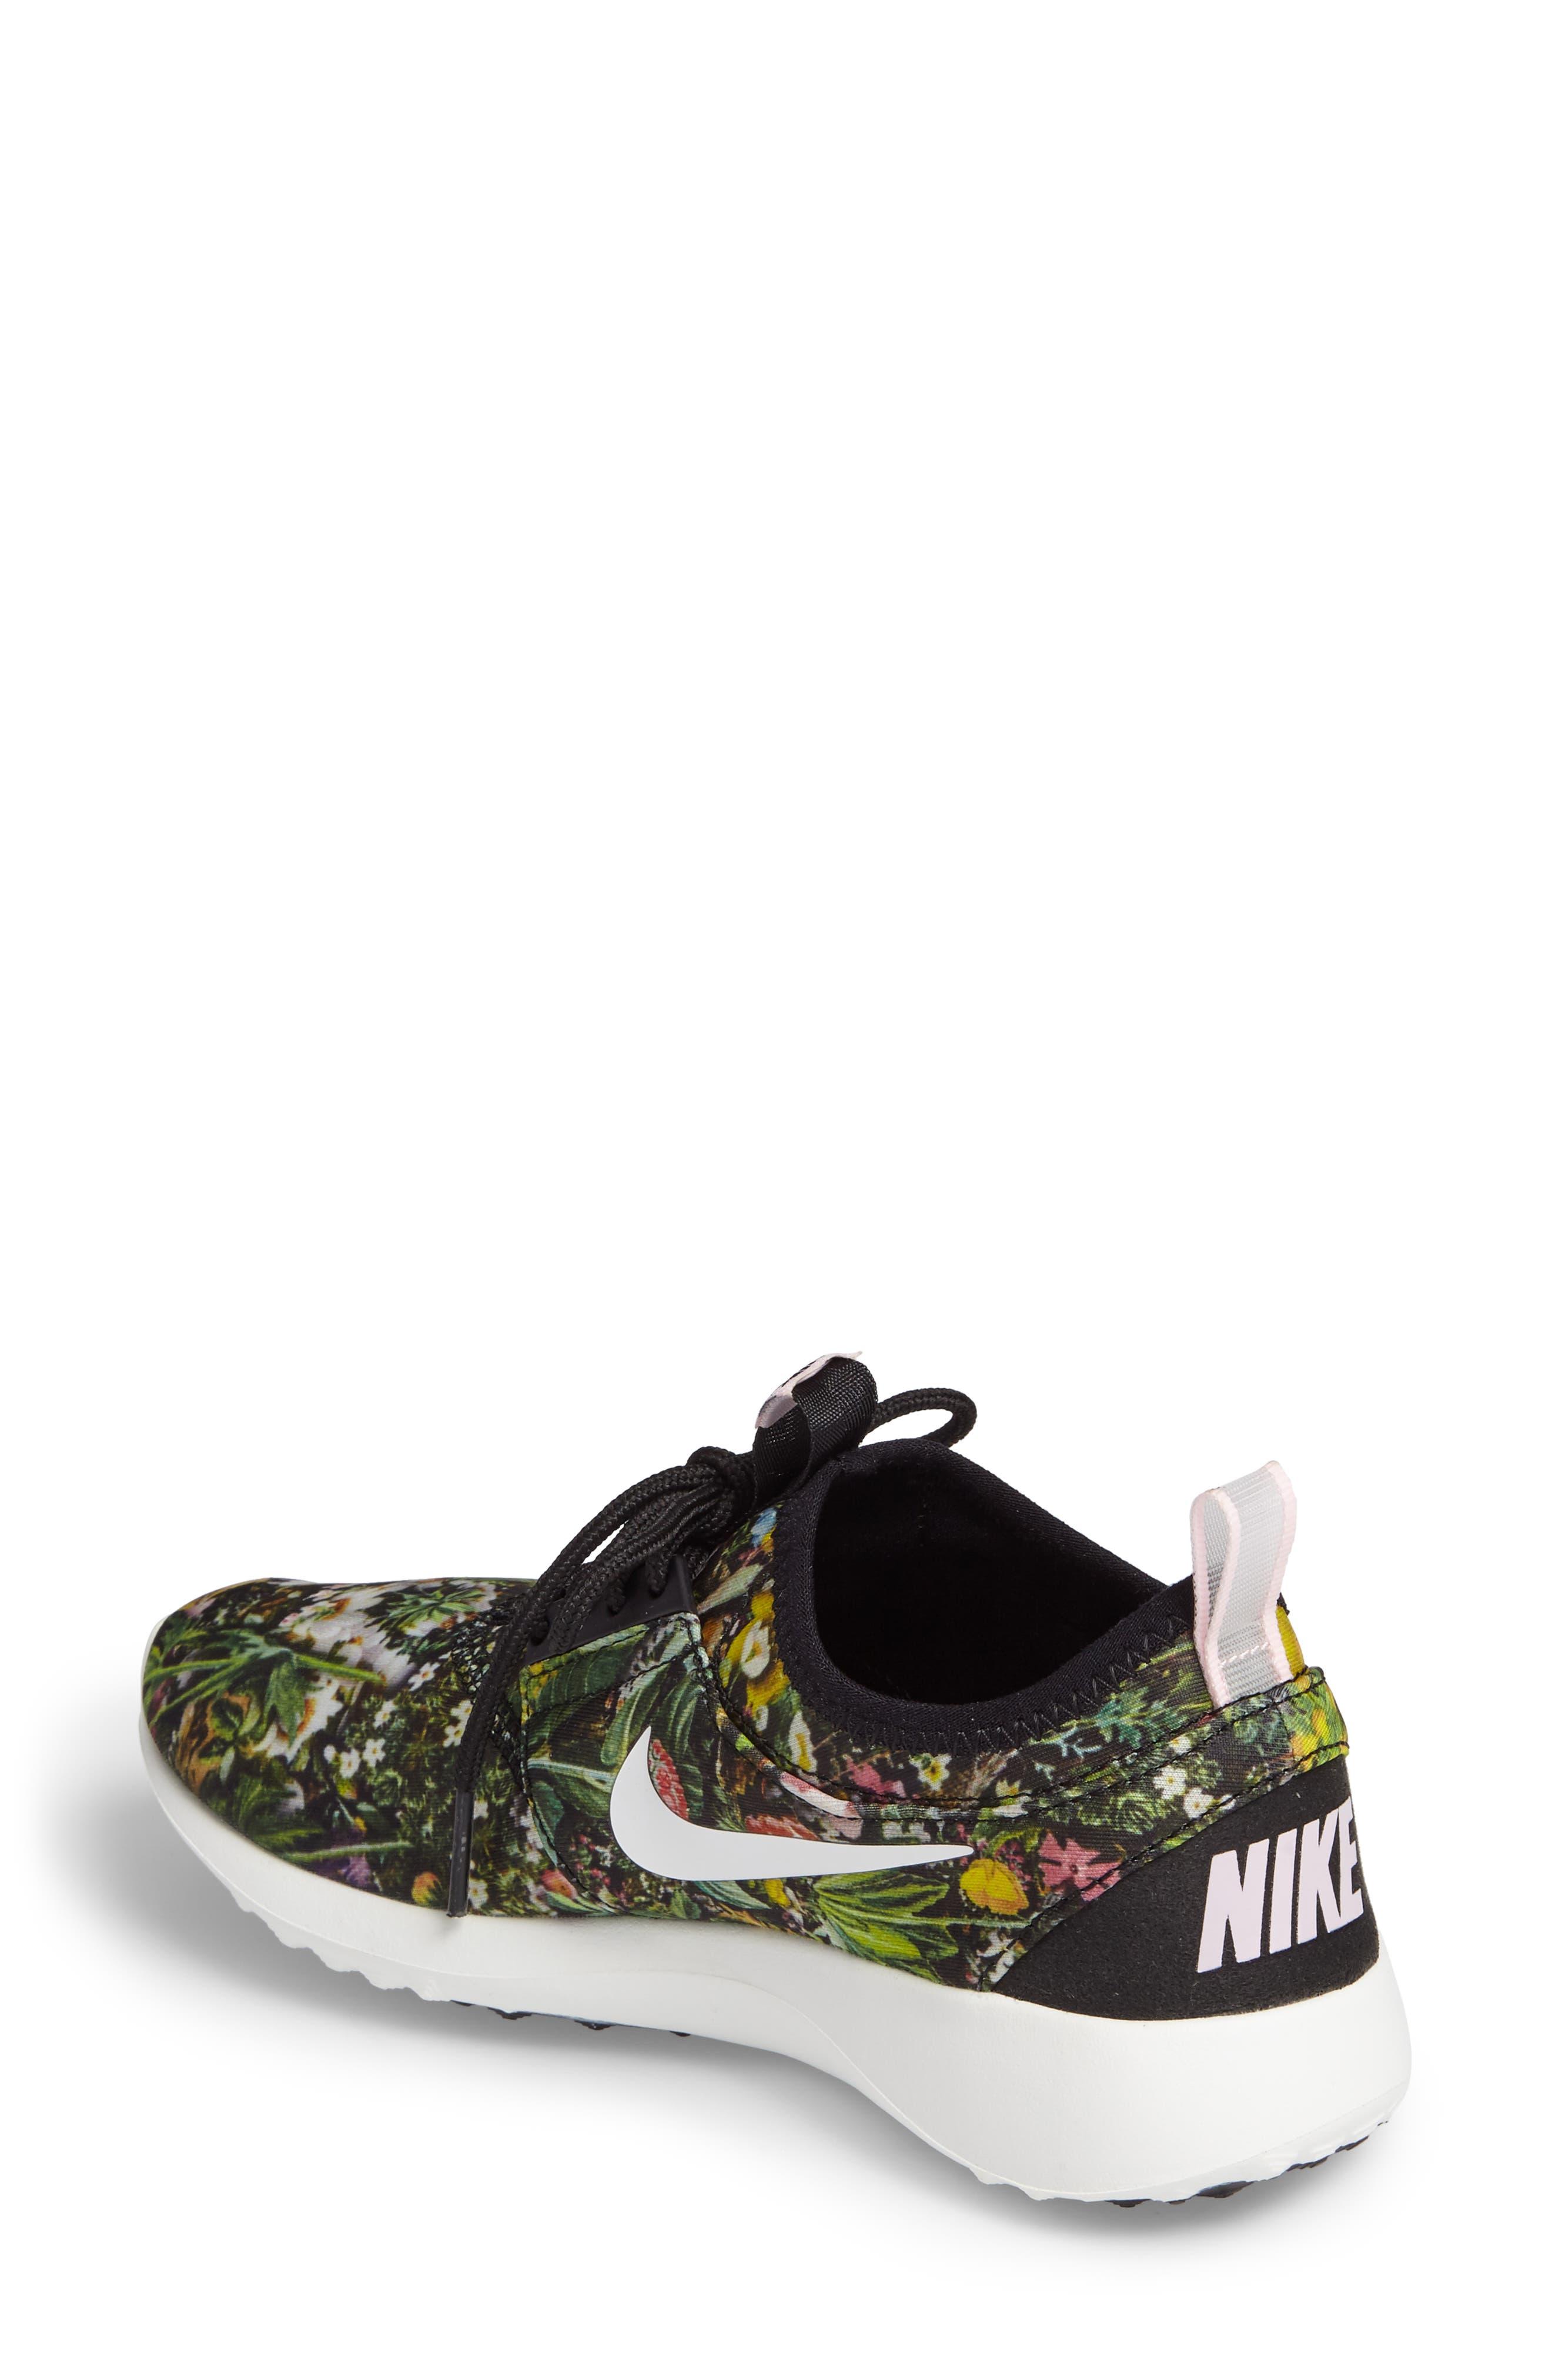 Juvenate SE Sneaker,                             Alternate thumbnail 18, color,